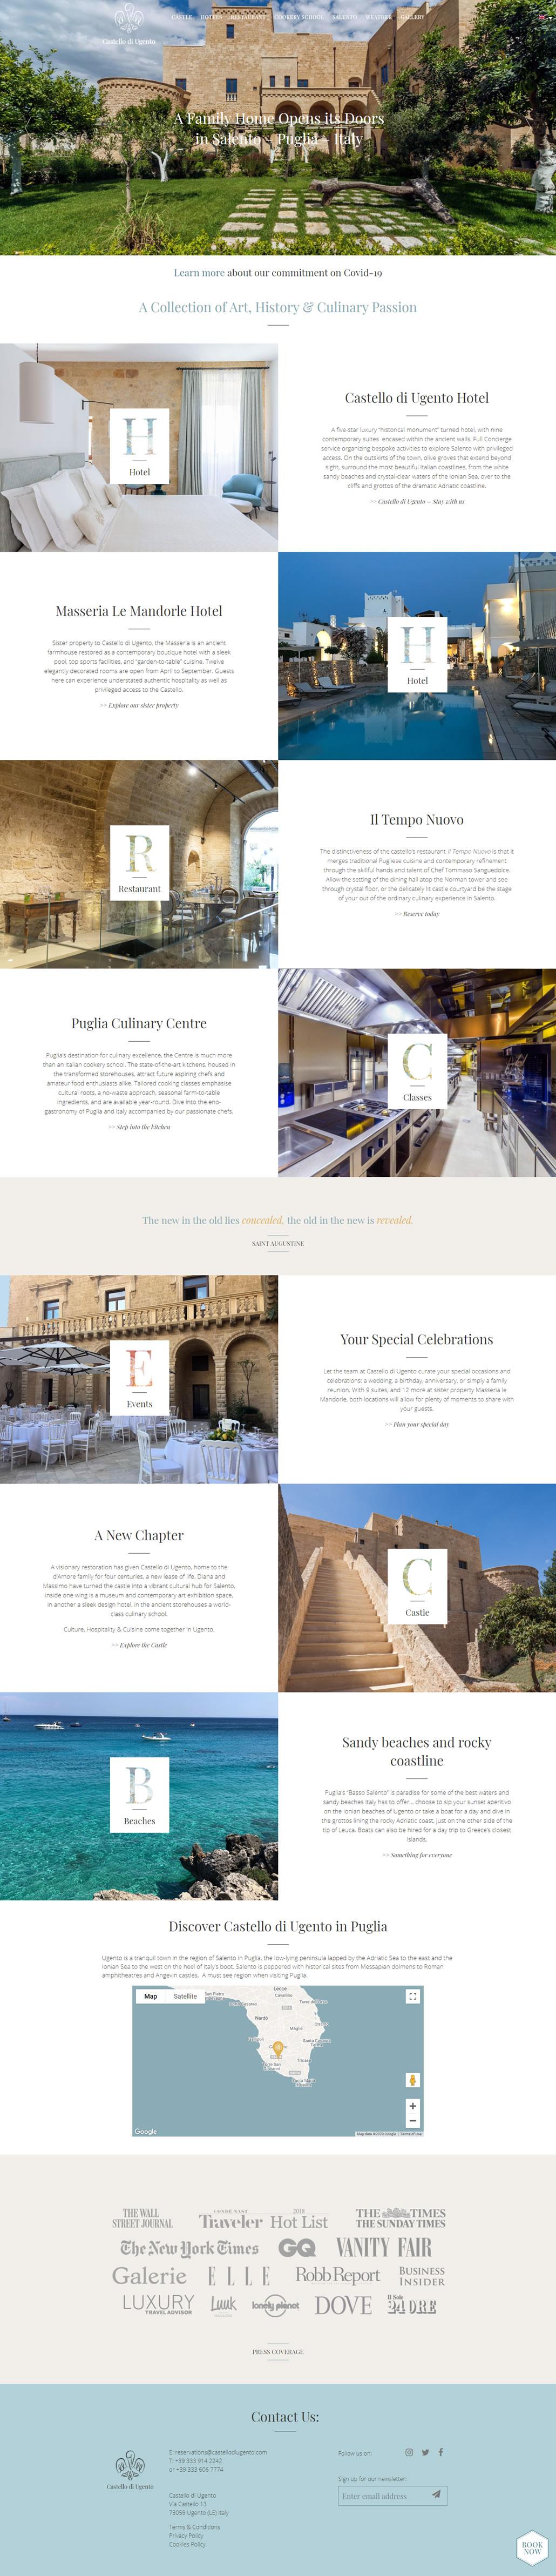 Castello di Ugento built using WordPress, web design by Convoy Media